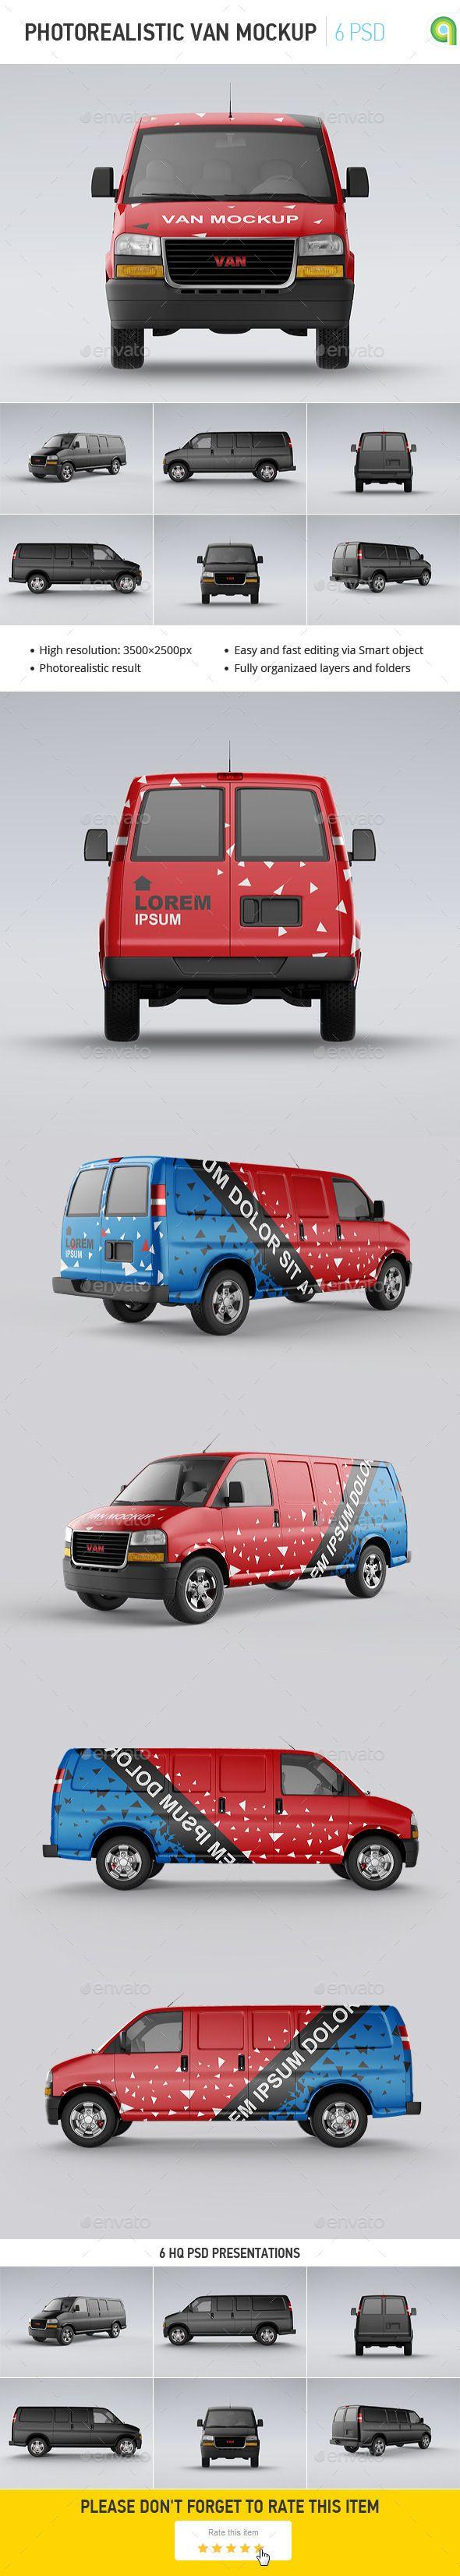 Van Mockup Mockup Print Mockup Car Wrap